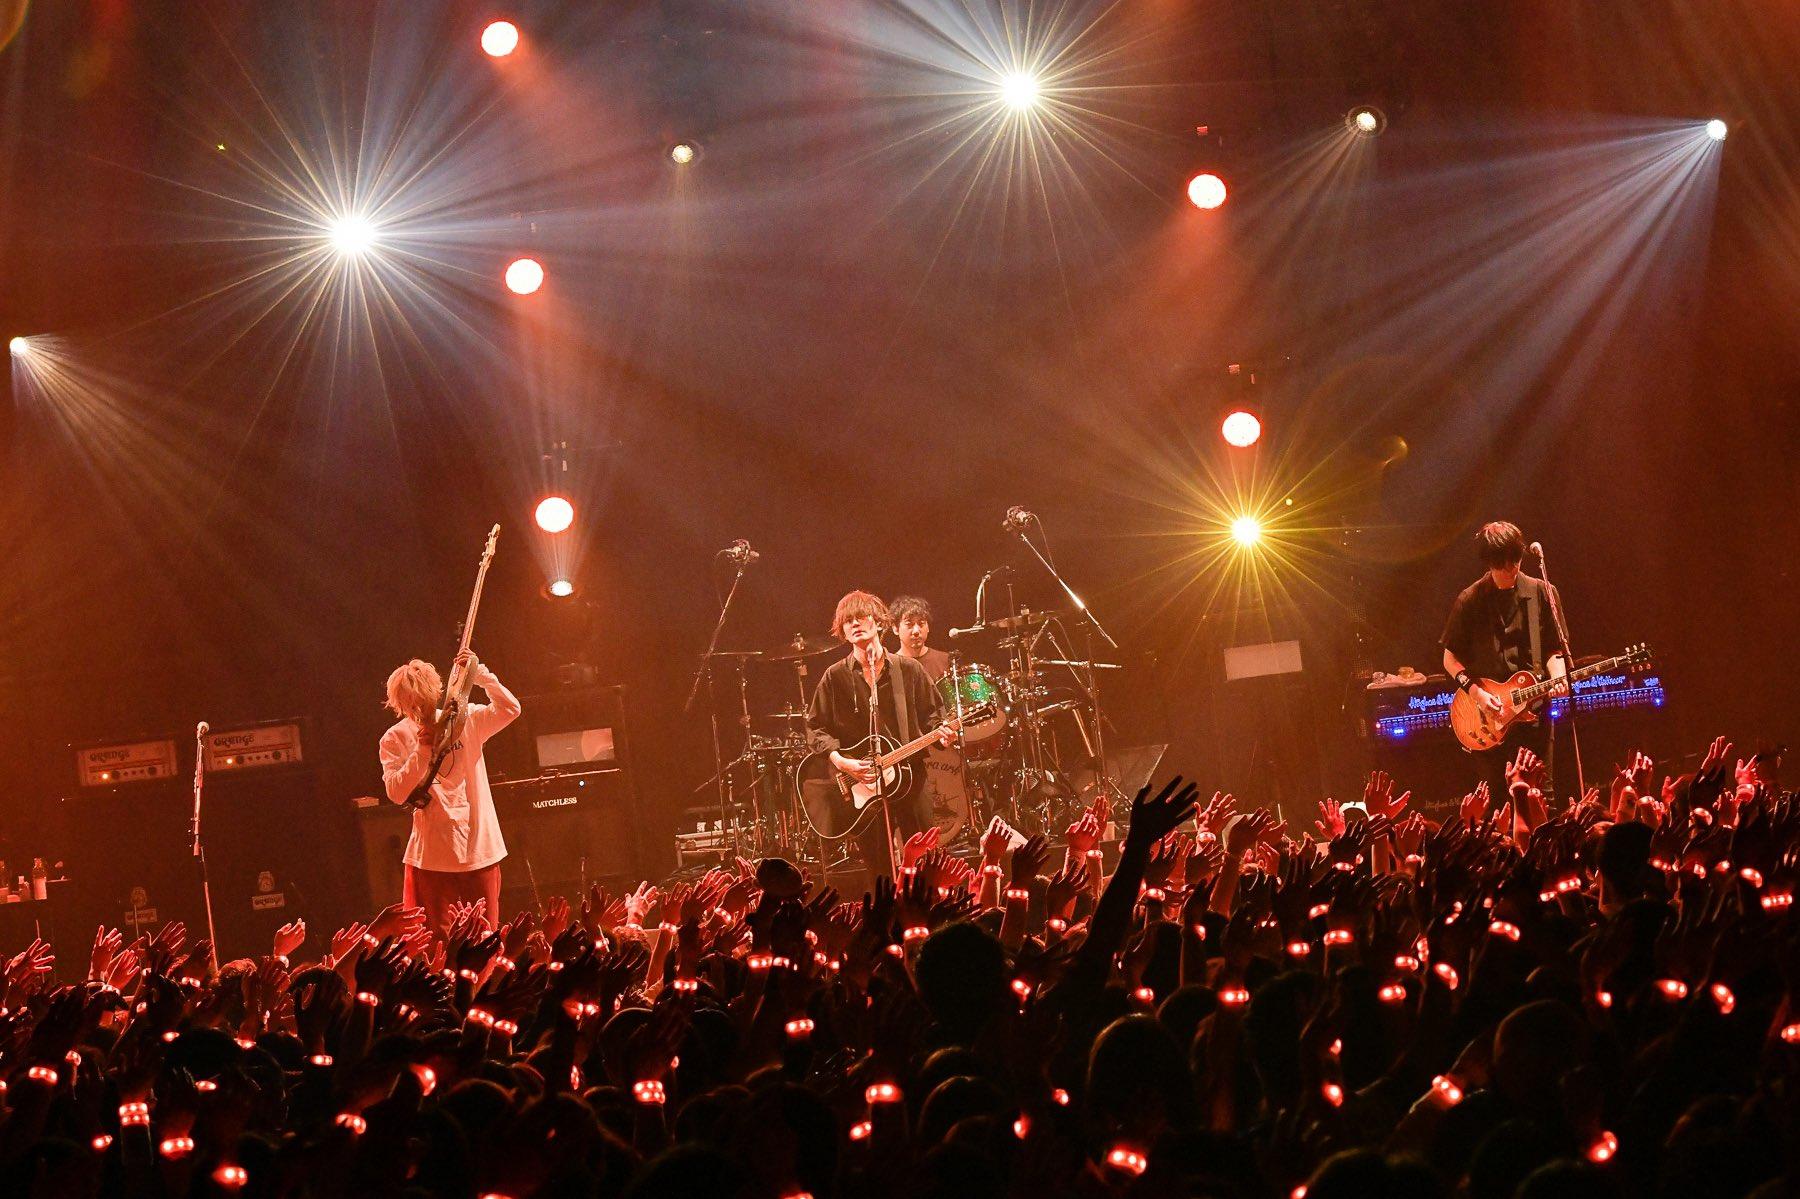 supernova ライブ